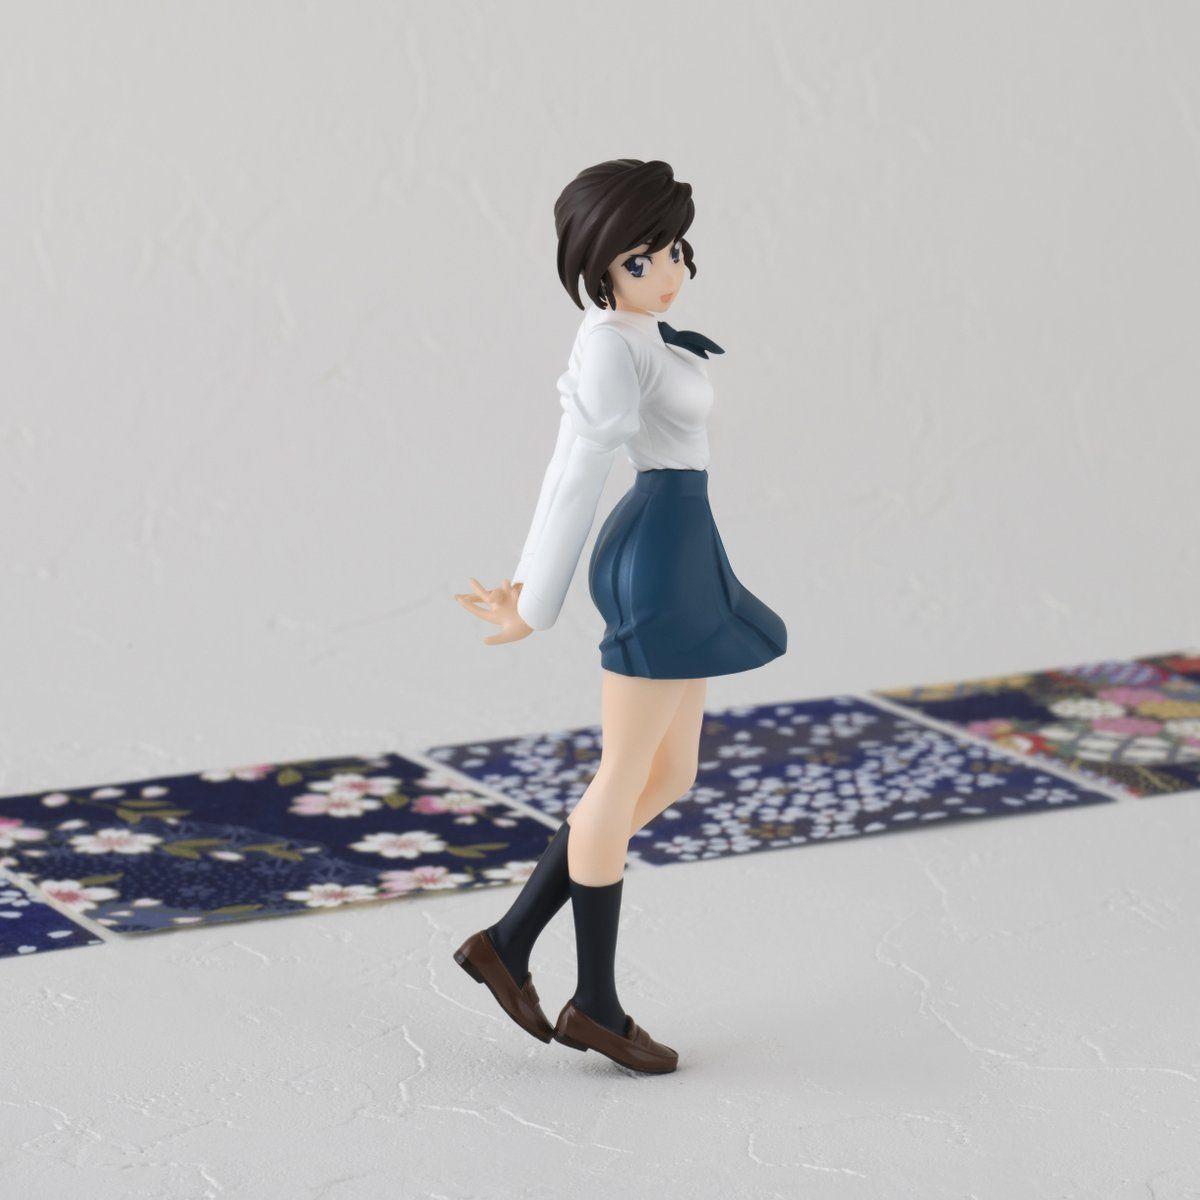 HG GIRLS『犬山まな』ゲゲゲの鬼太郎 完成品フィギュア-002